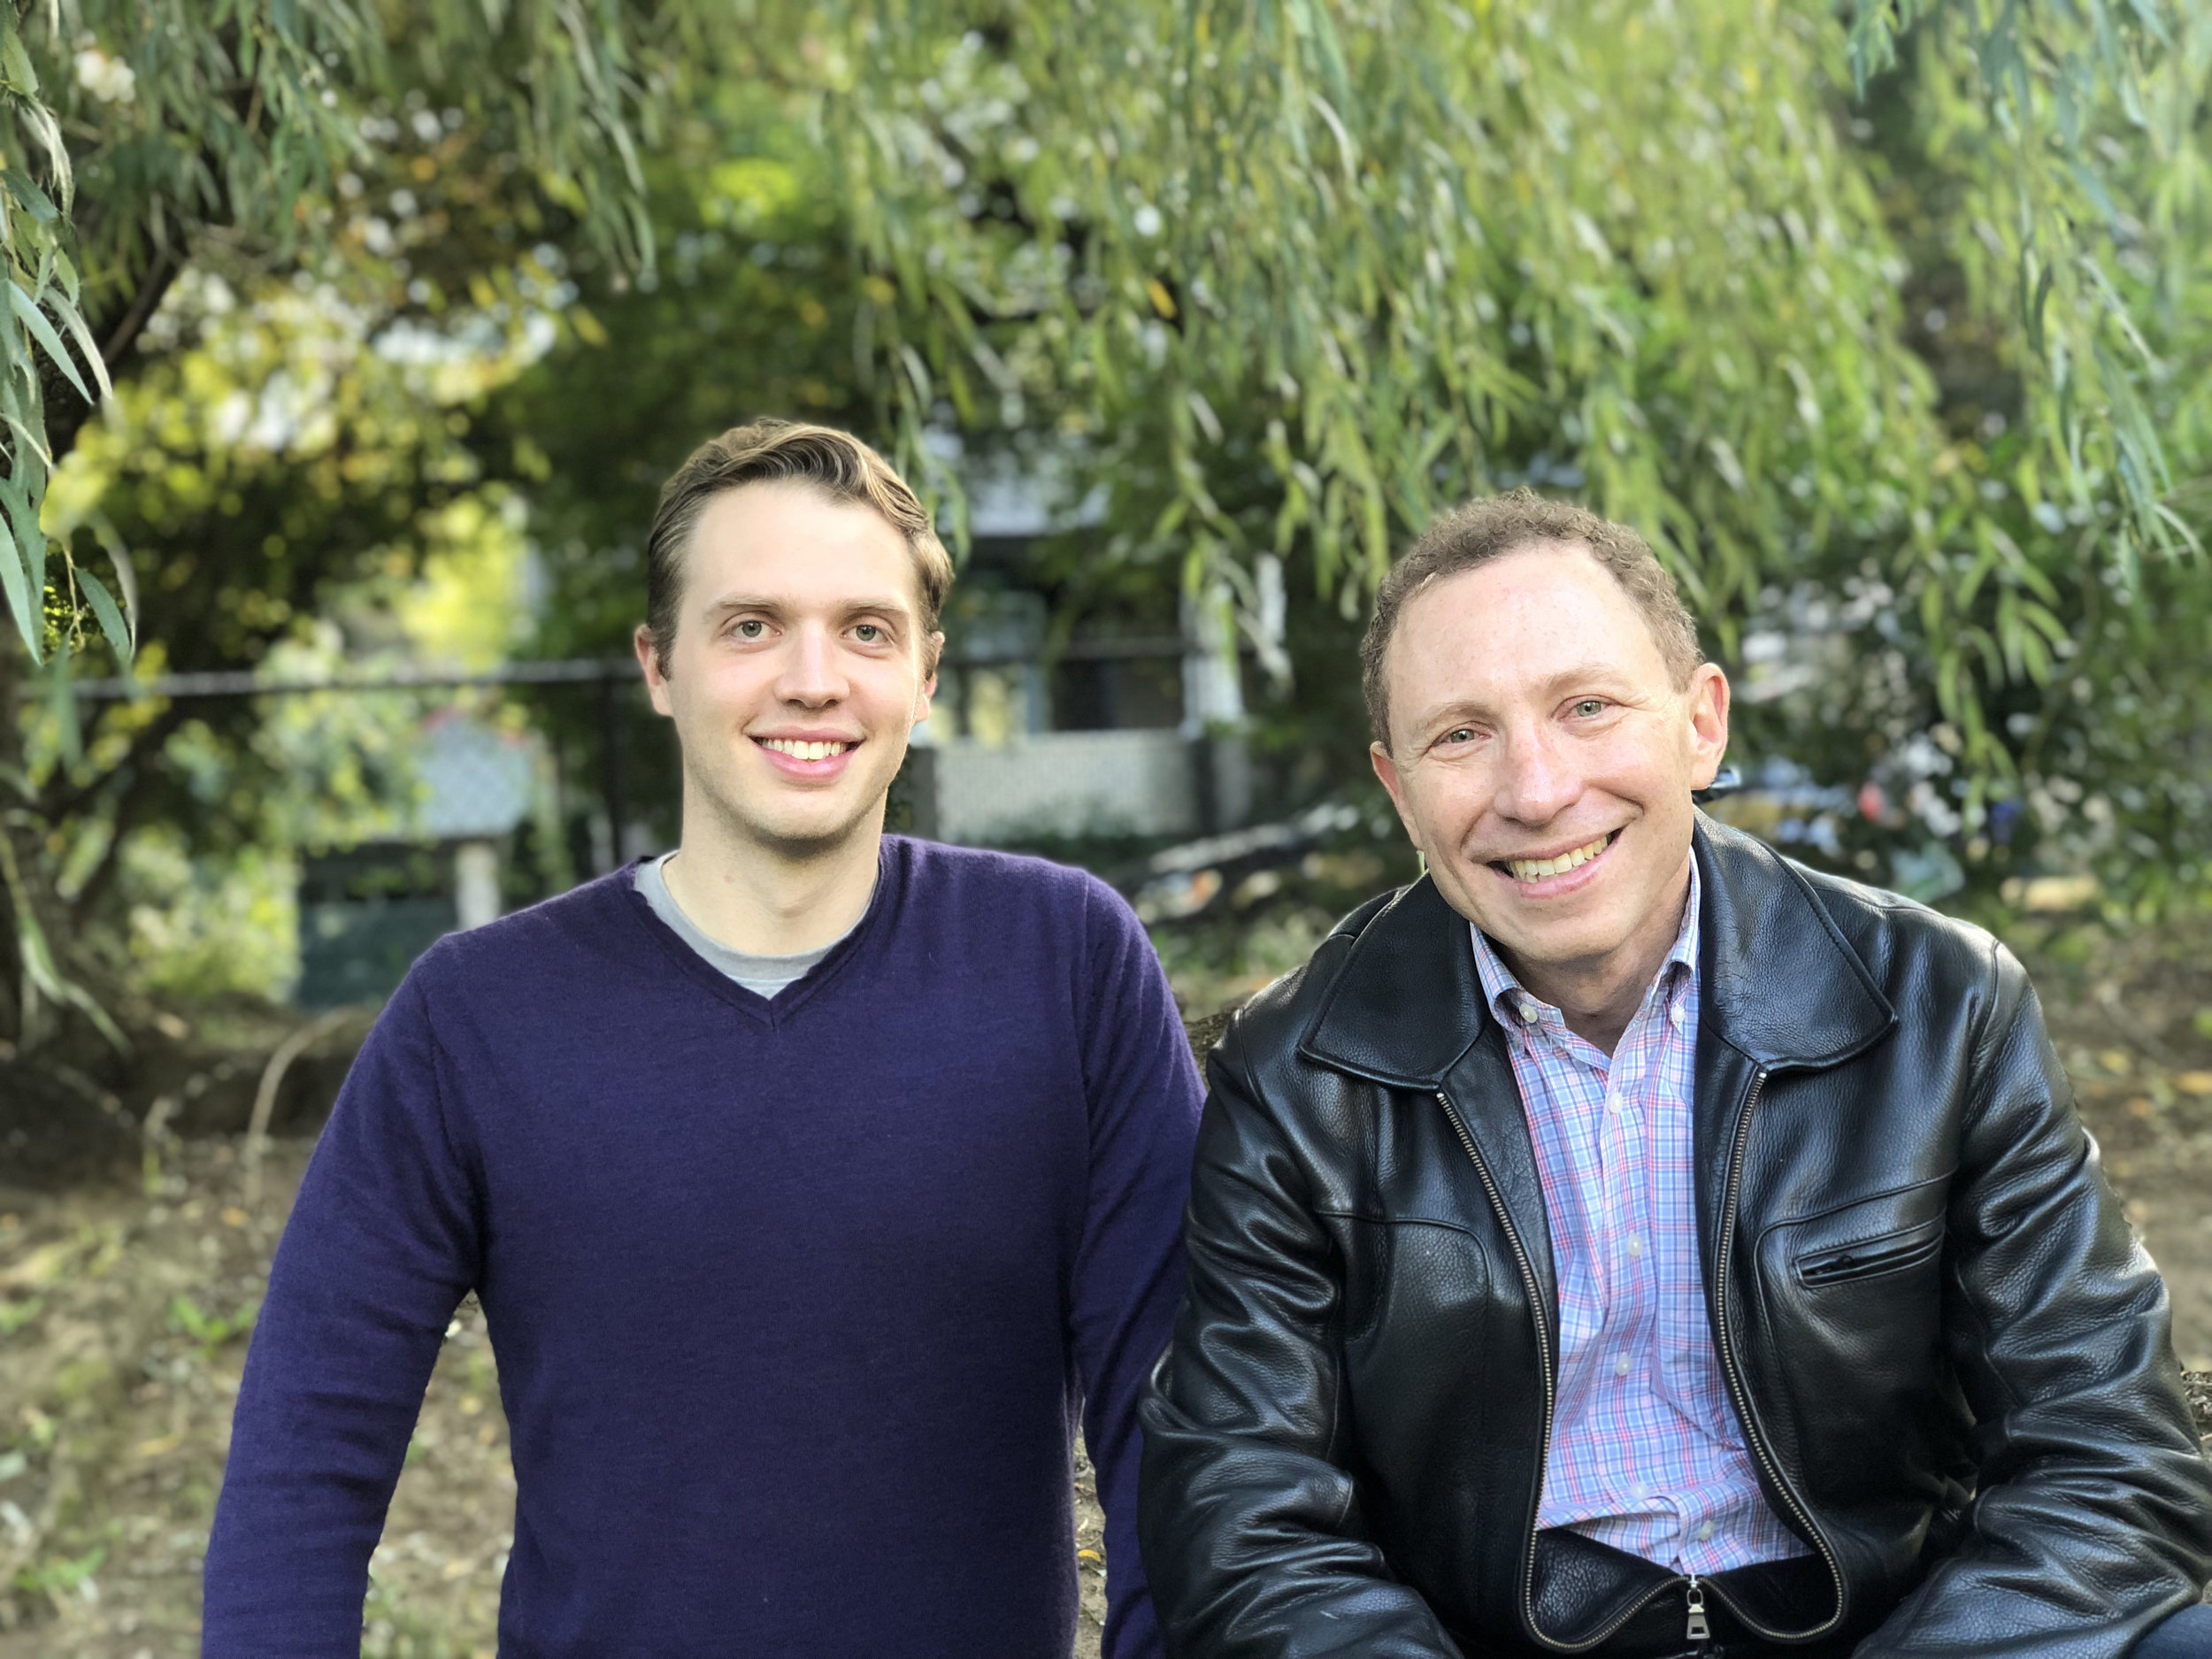 Ryan Stelzer & David Brendel MD PhD,  Co-founders